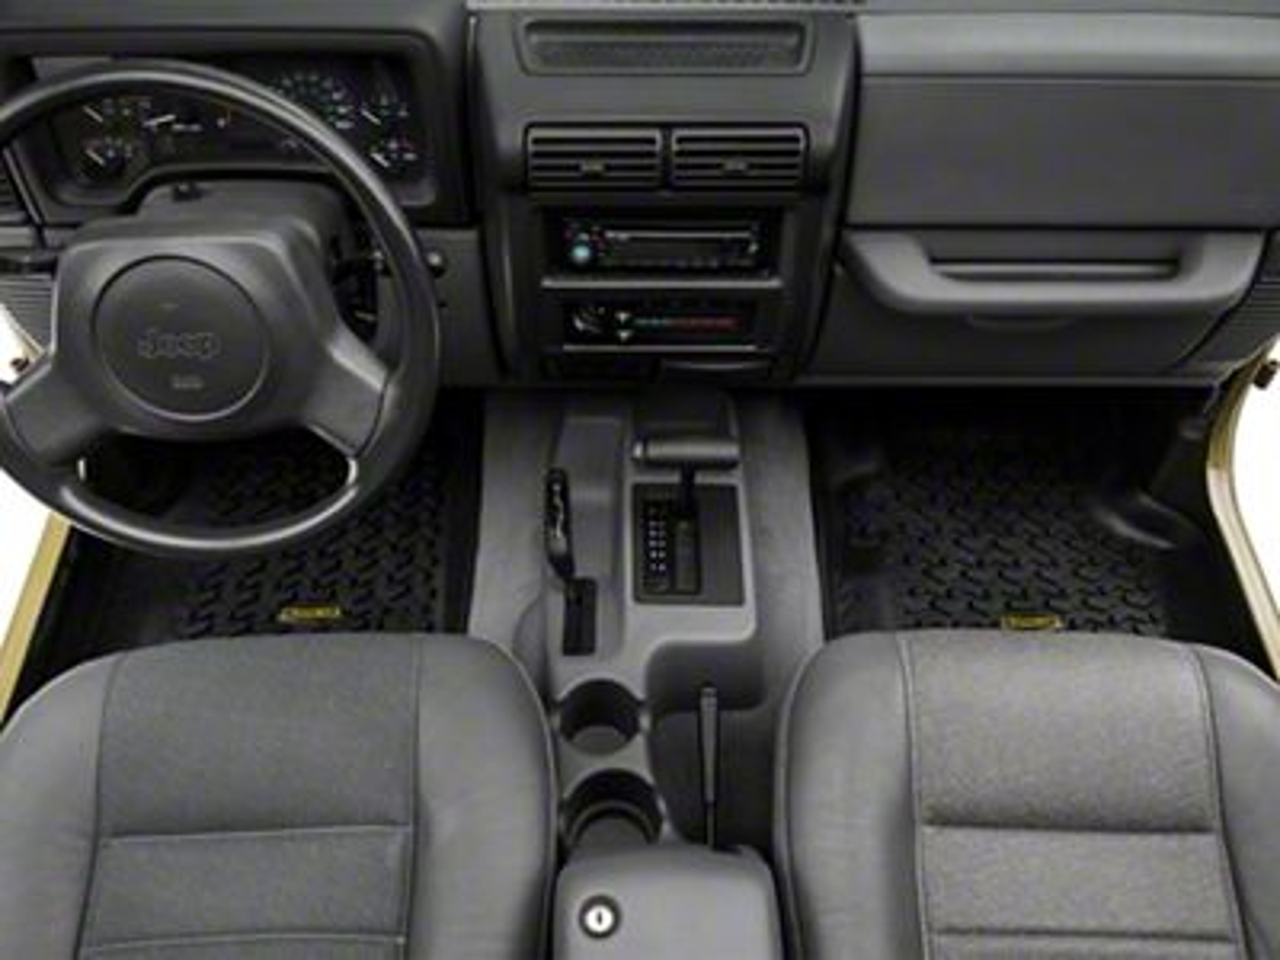 Barricade Front, Rear & Cargo Floor Mats - Black (97-06 Jeep Wrangler TJ)